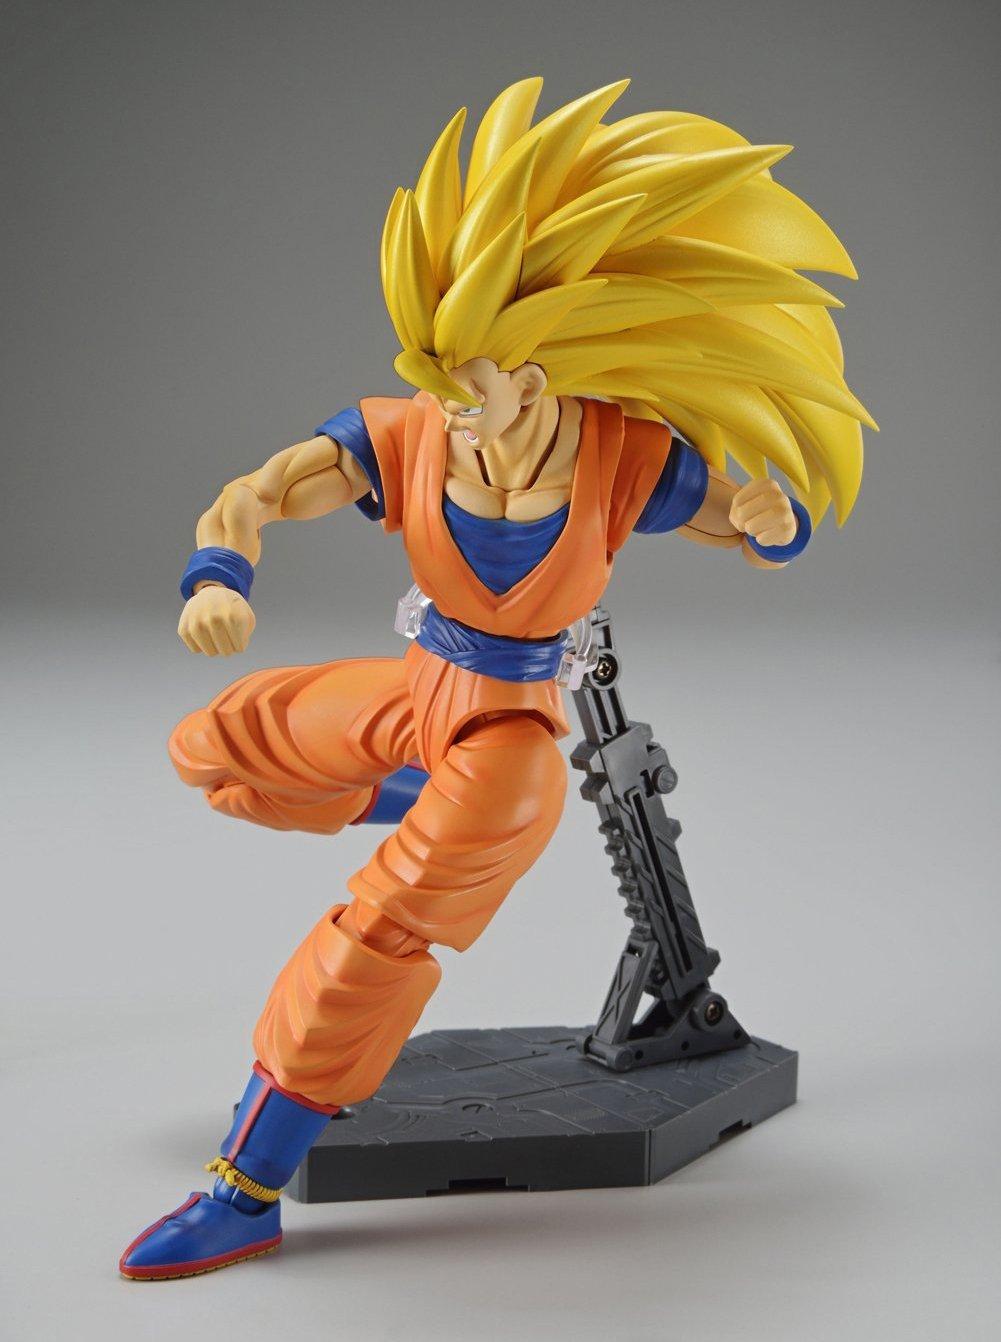 Dragon Ball Z Plastic Model Kit: Super Saiyan 3 Son Goku